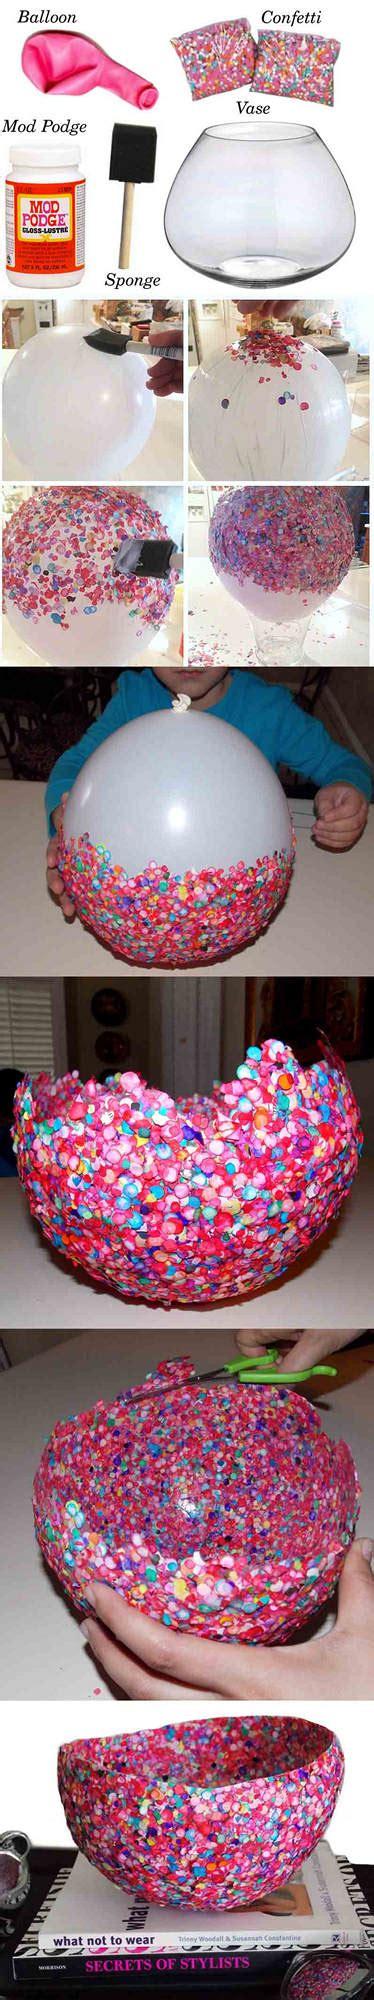 easy crafts for adults easy crafts for adults www pixshark com images galleries with a bite